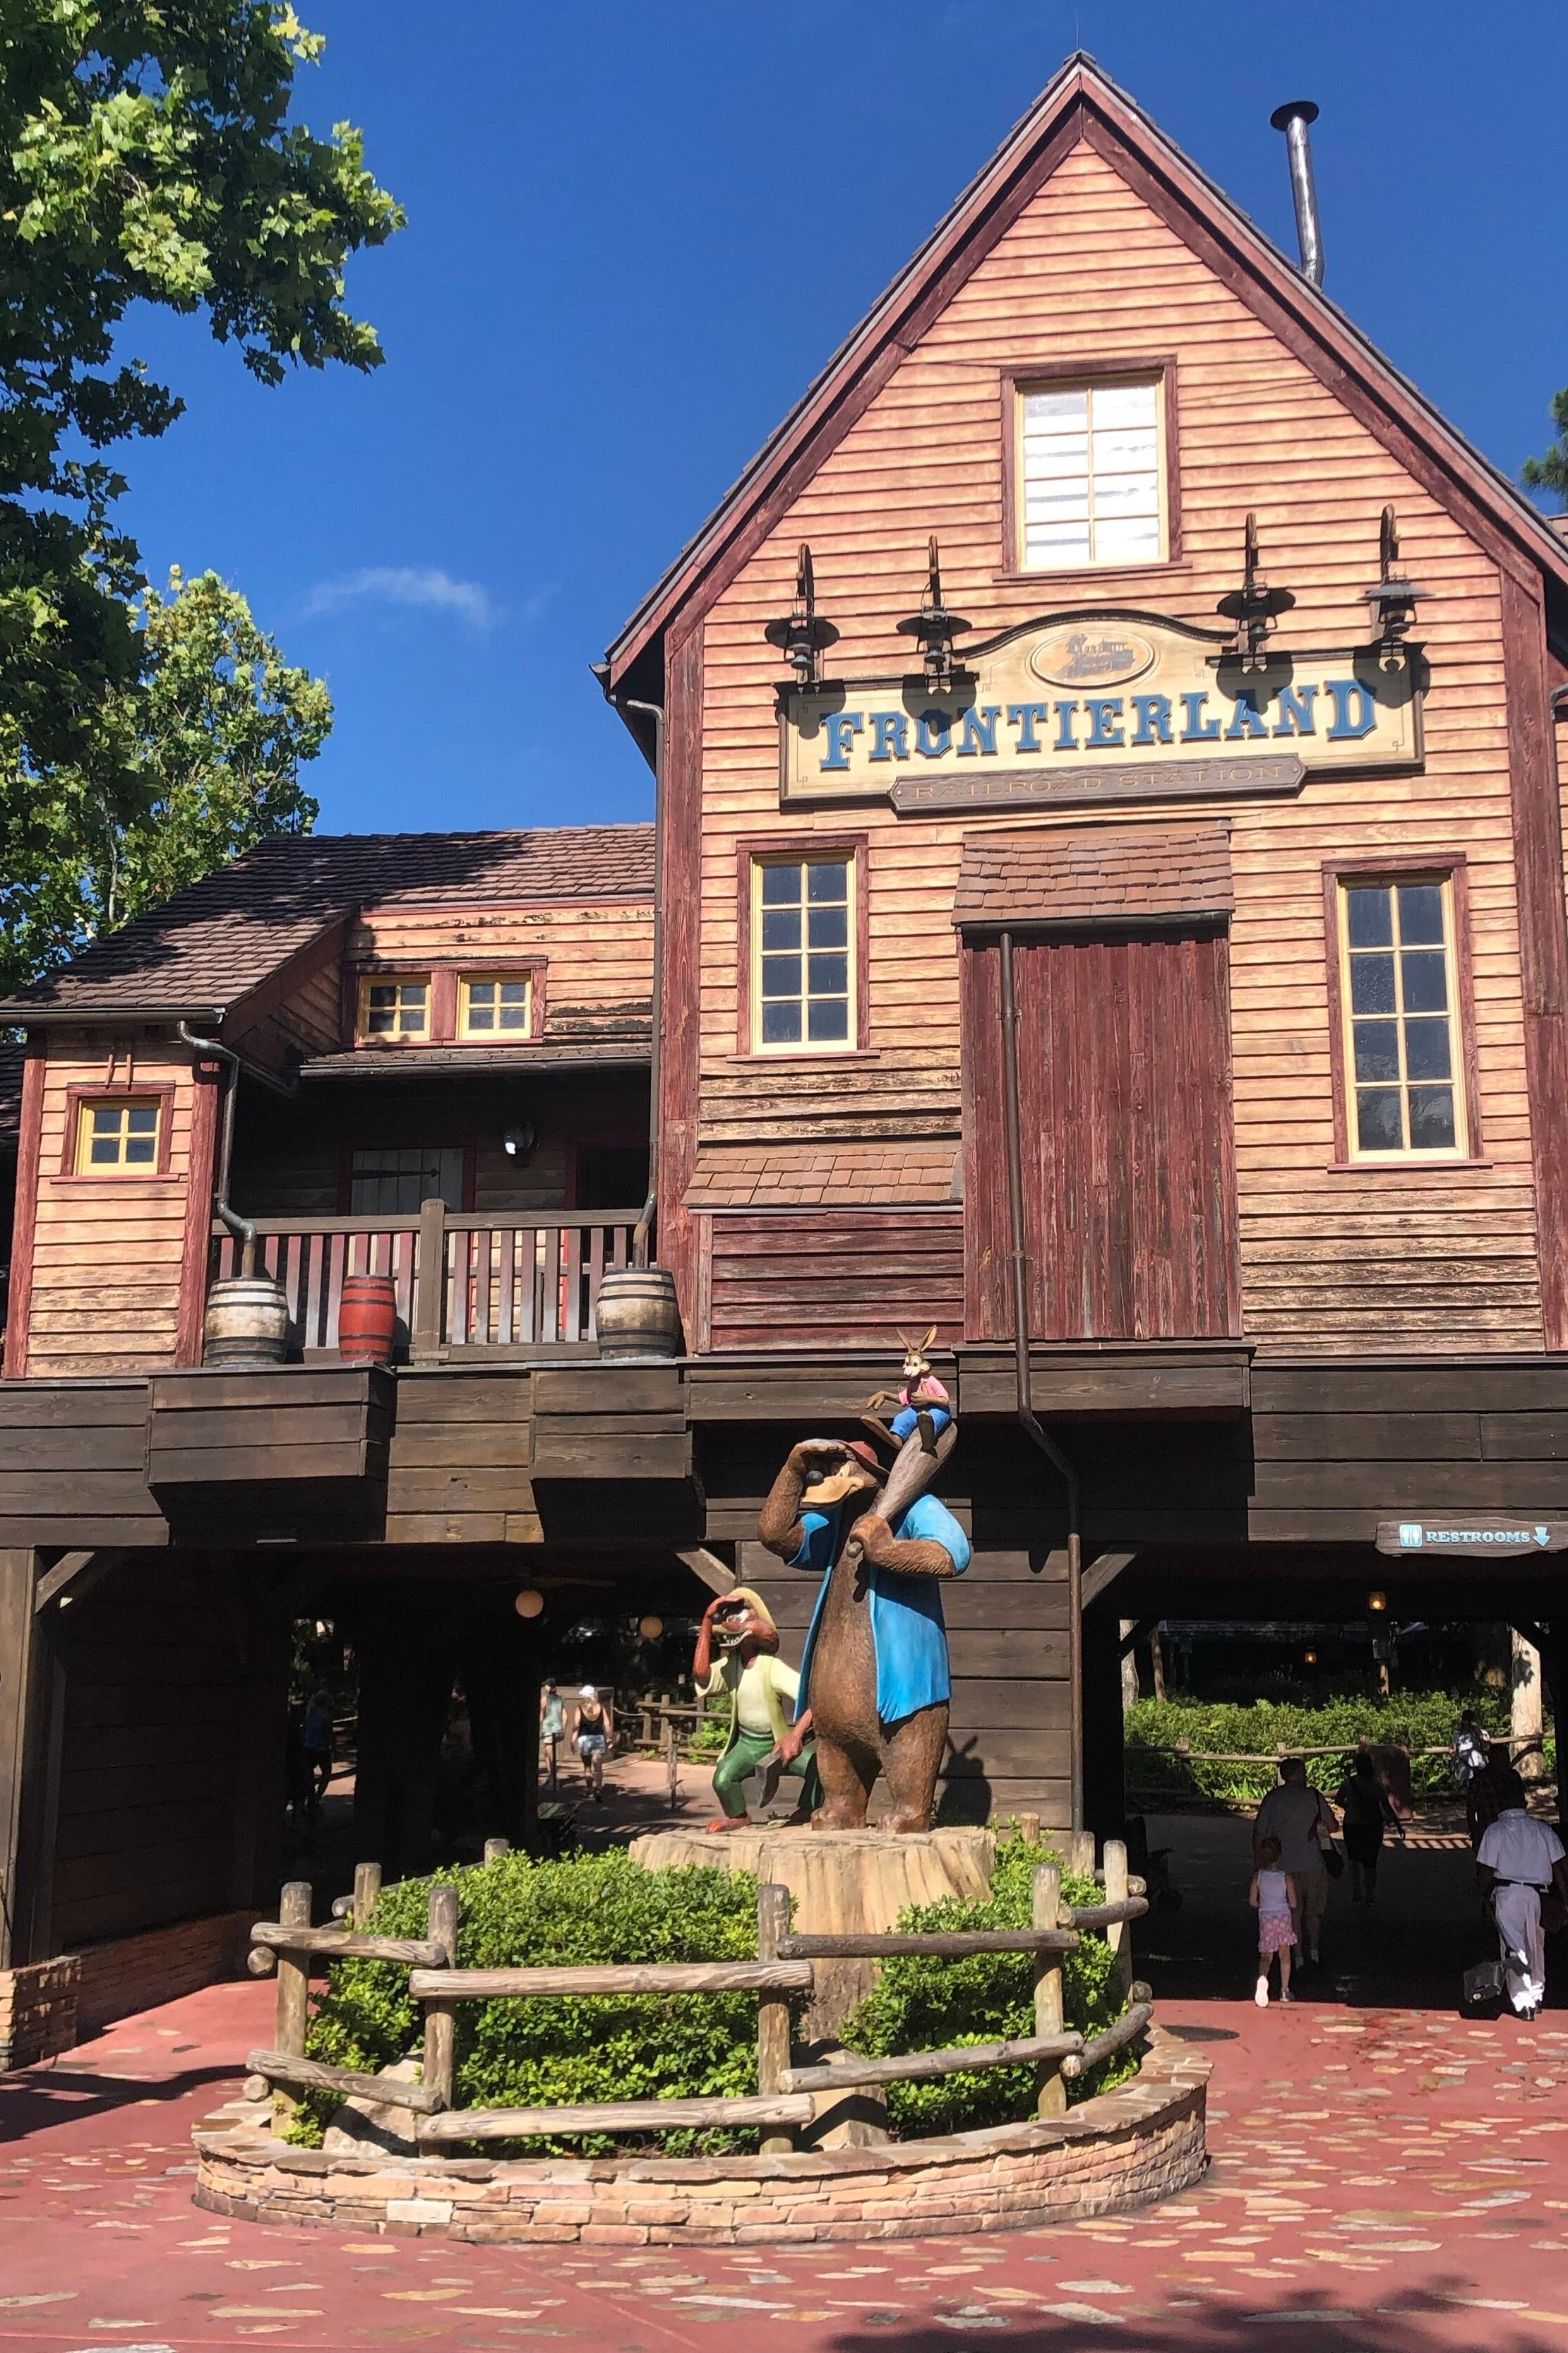 Frontierland at Magic Kingdom Disney World!